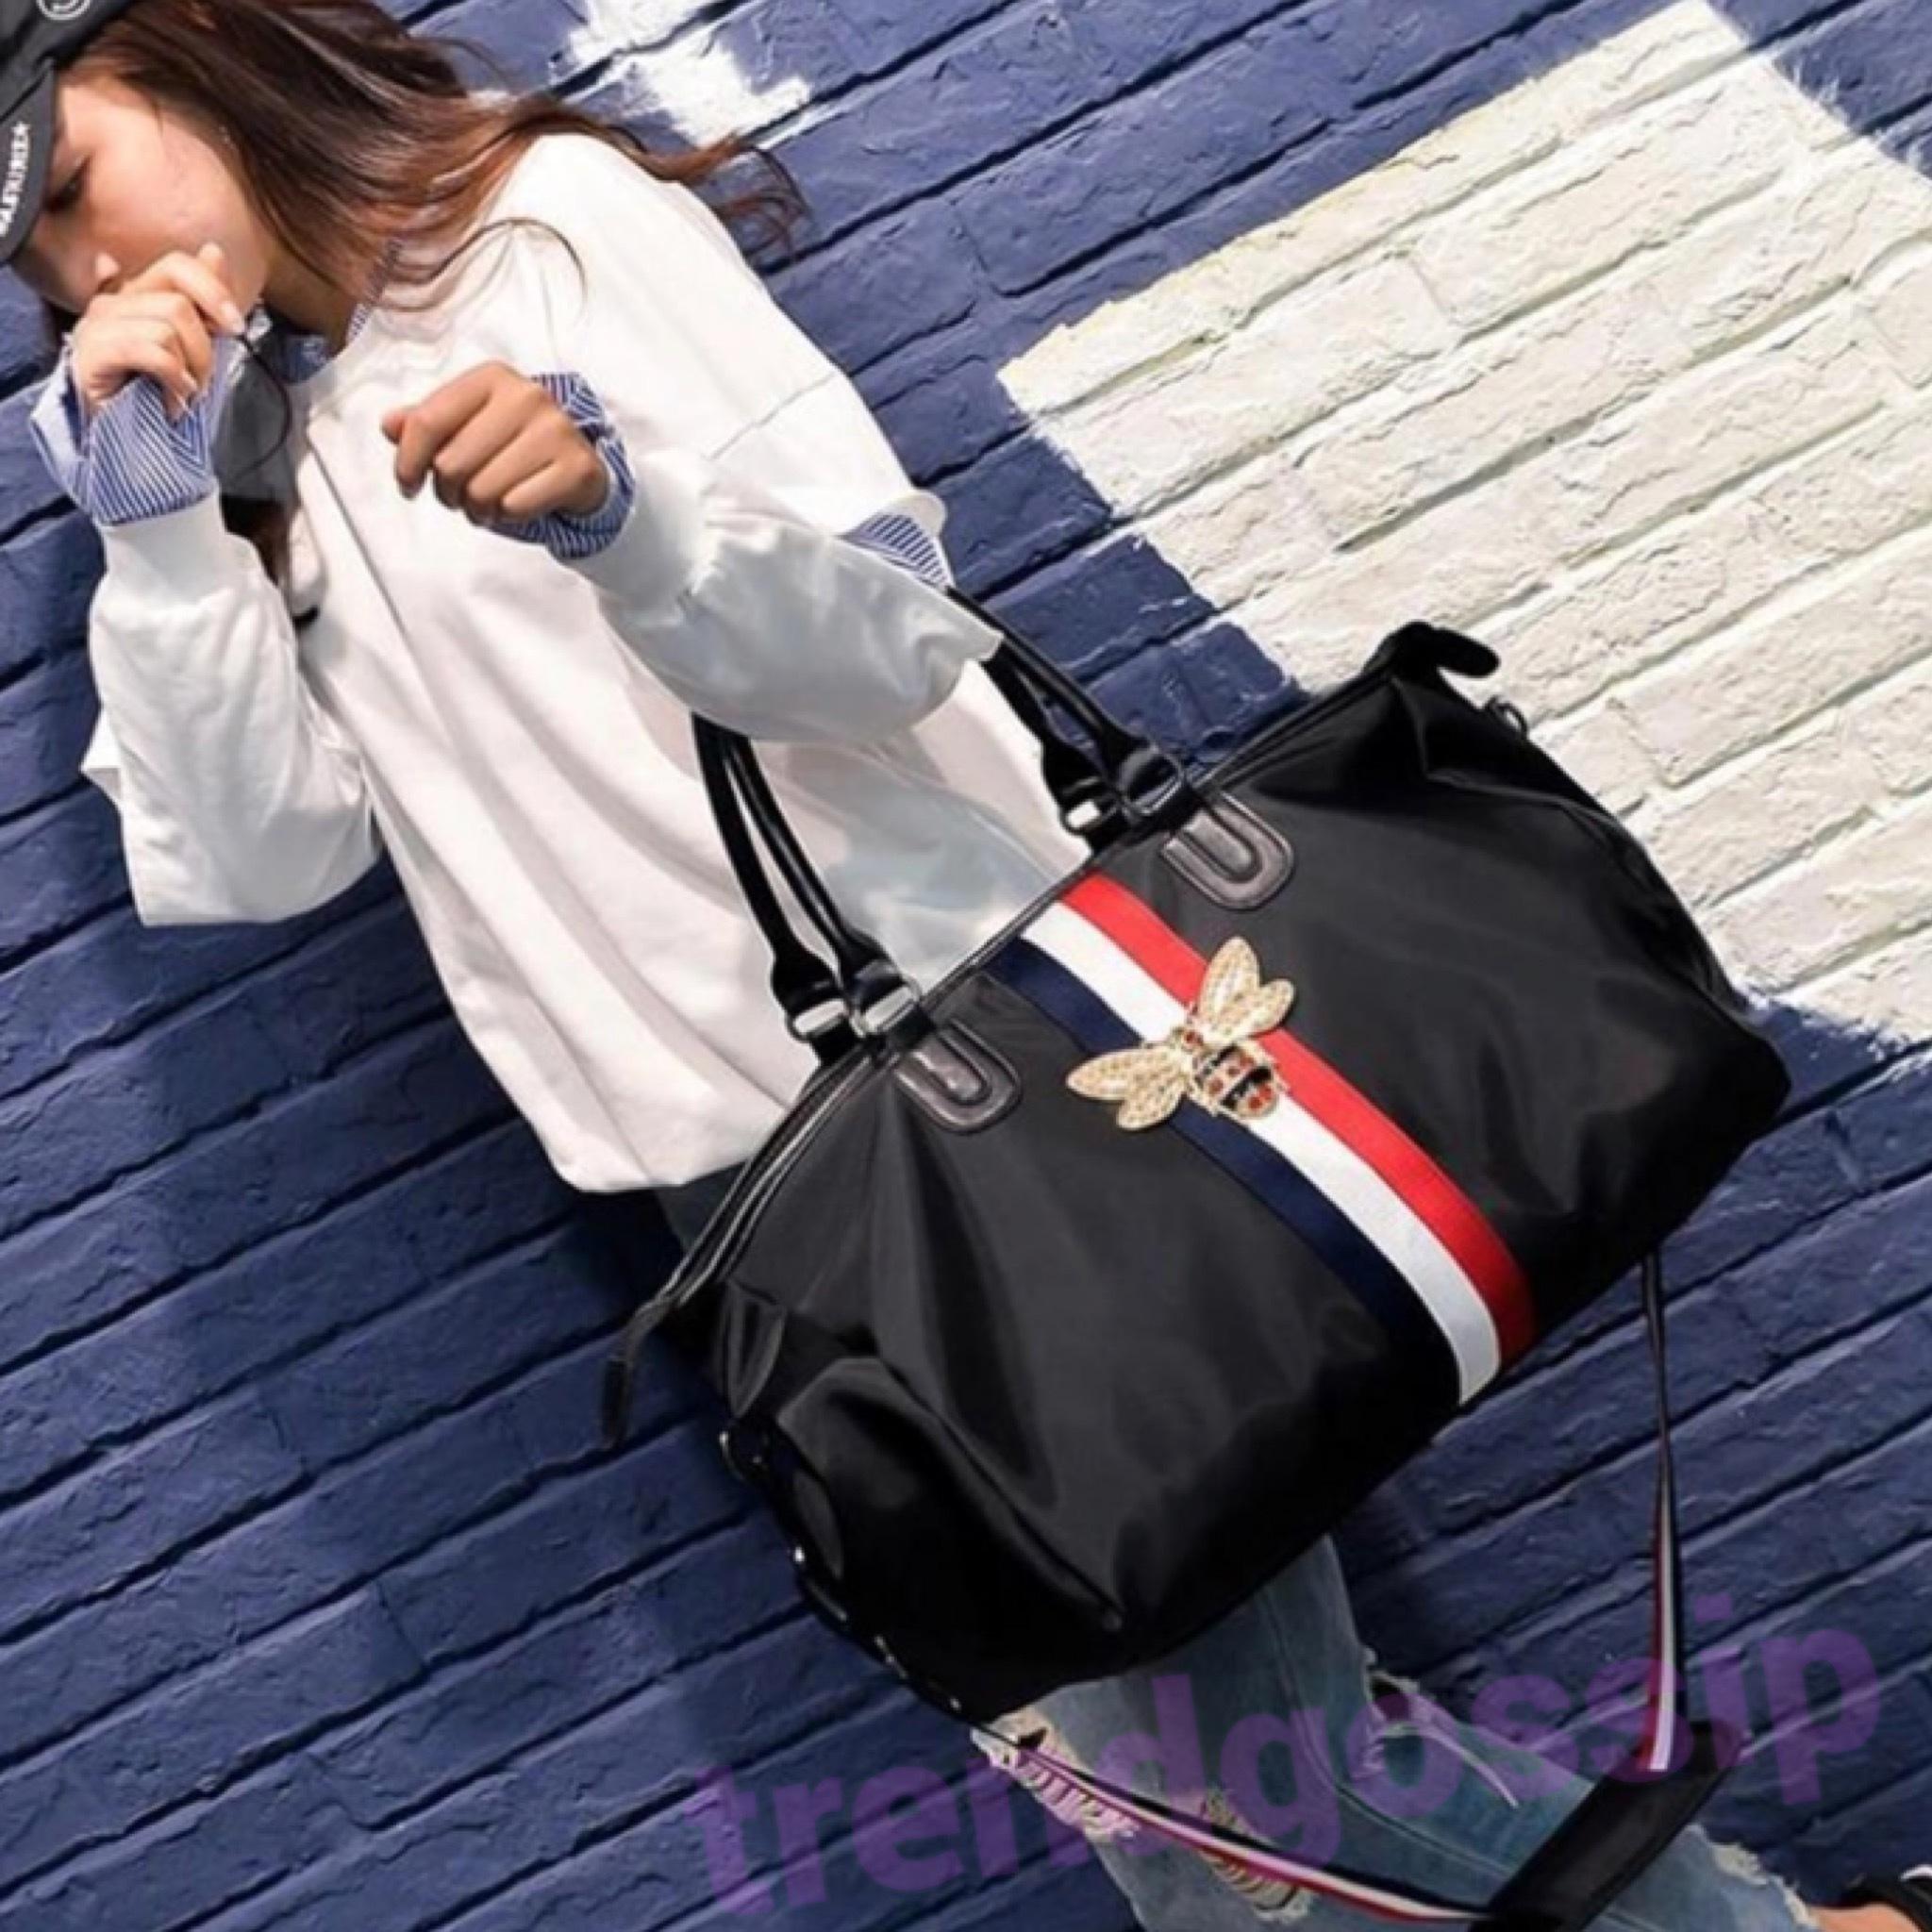 Beeバックルトリコロールナイロンボストンバッグ/旅行/鞄/ショルダーバッグ